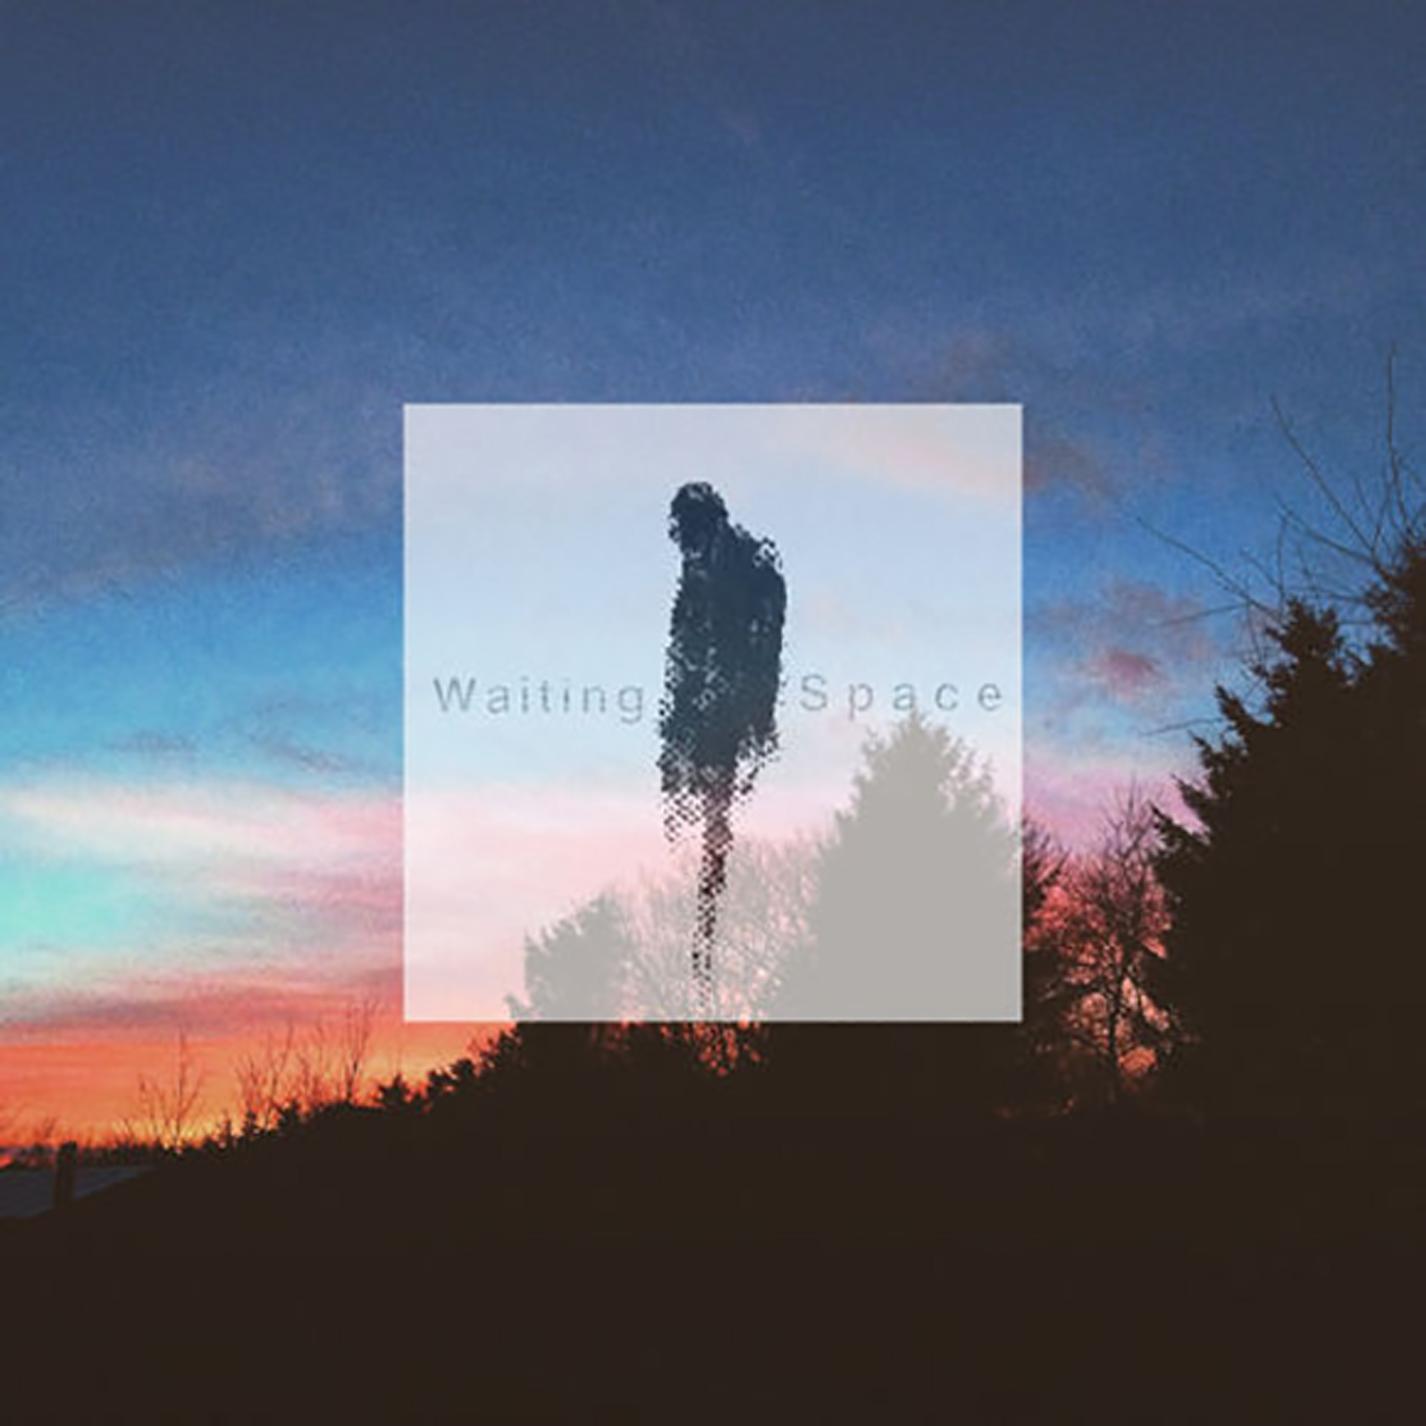 Waiting Space - Borrowed Memories (Single Cover) [bigger]).jpg